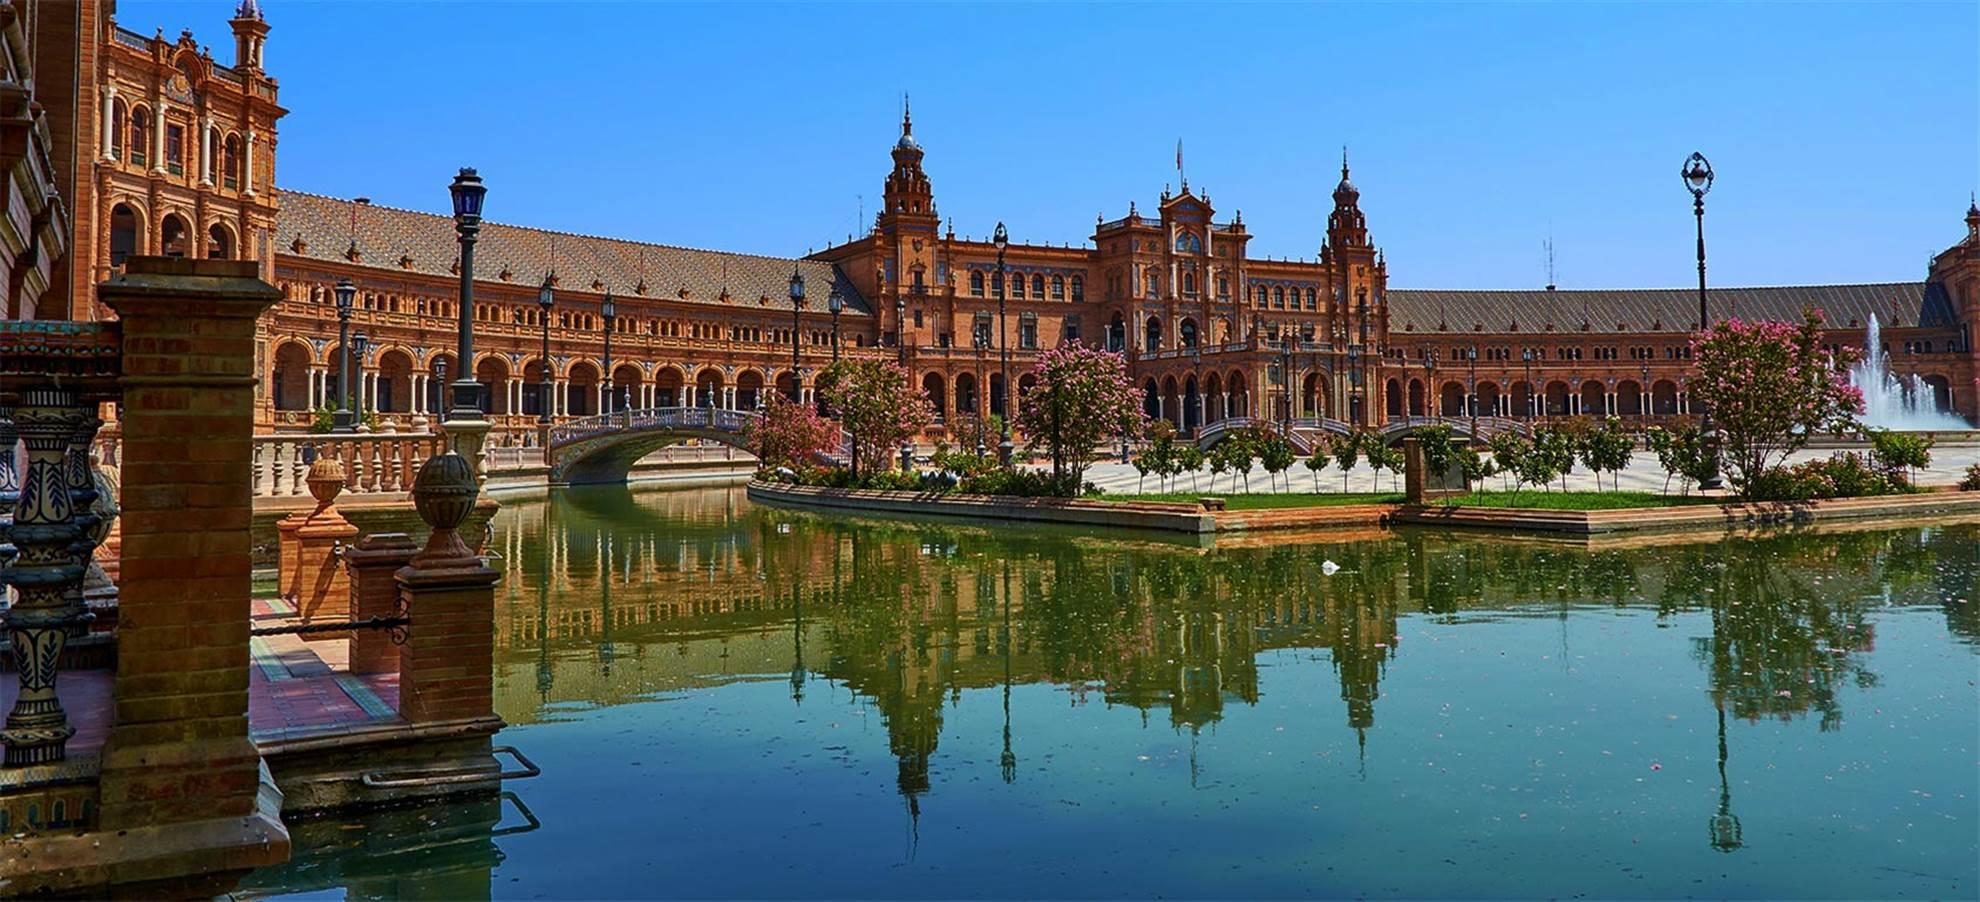 Séville, Fascinante et Monumentale (SVQFASMO)